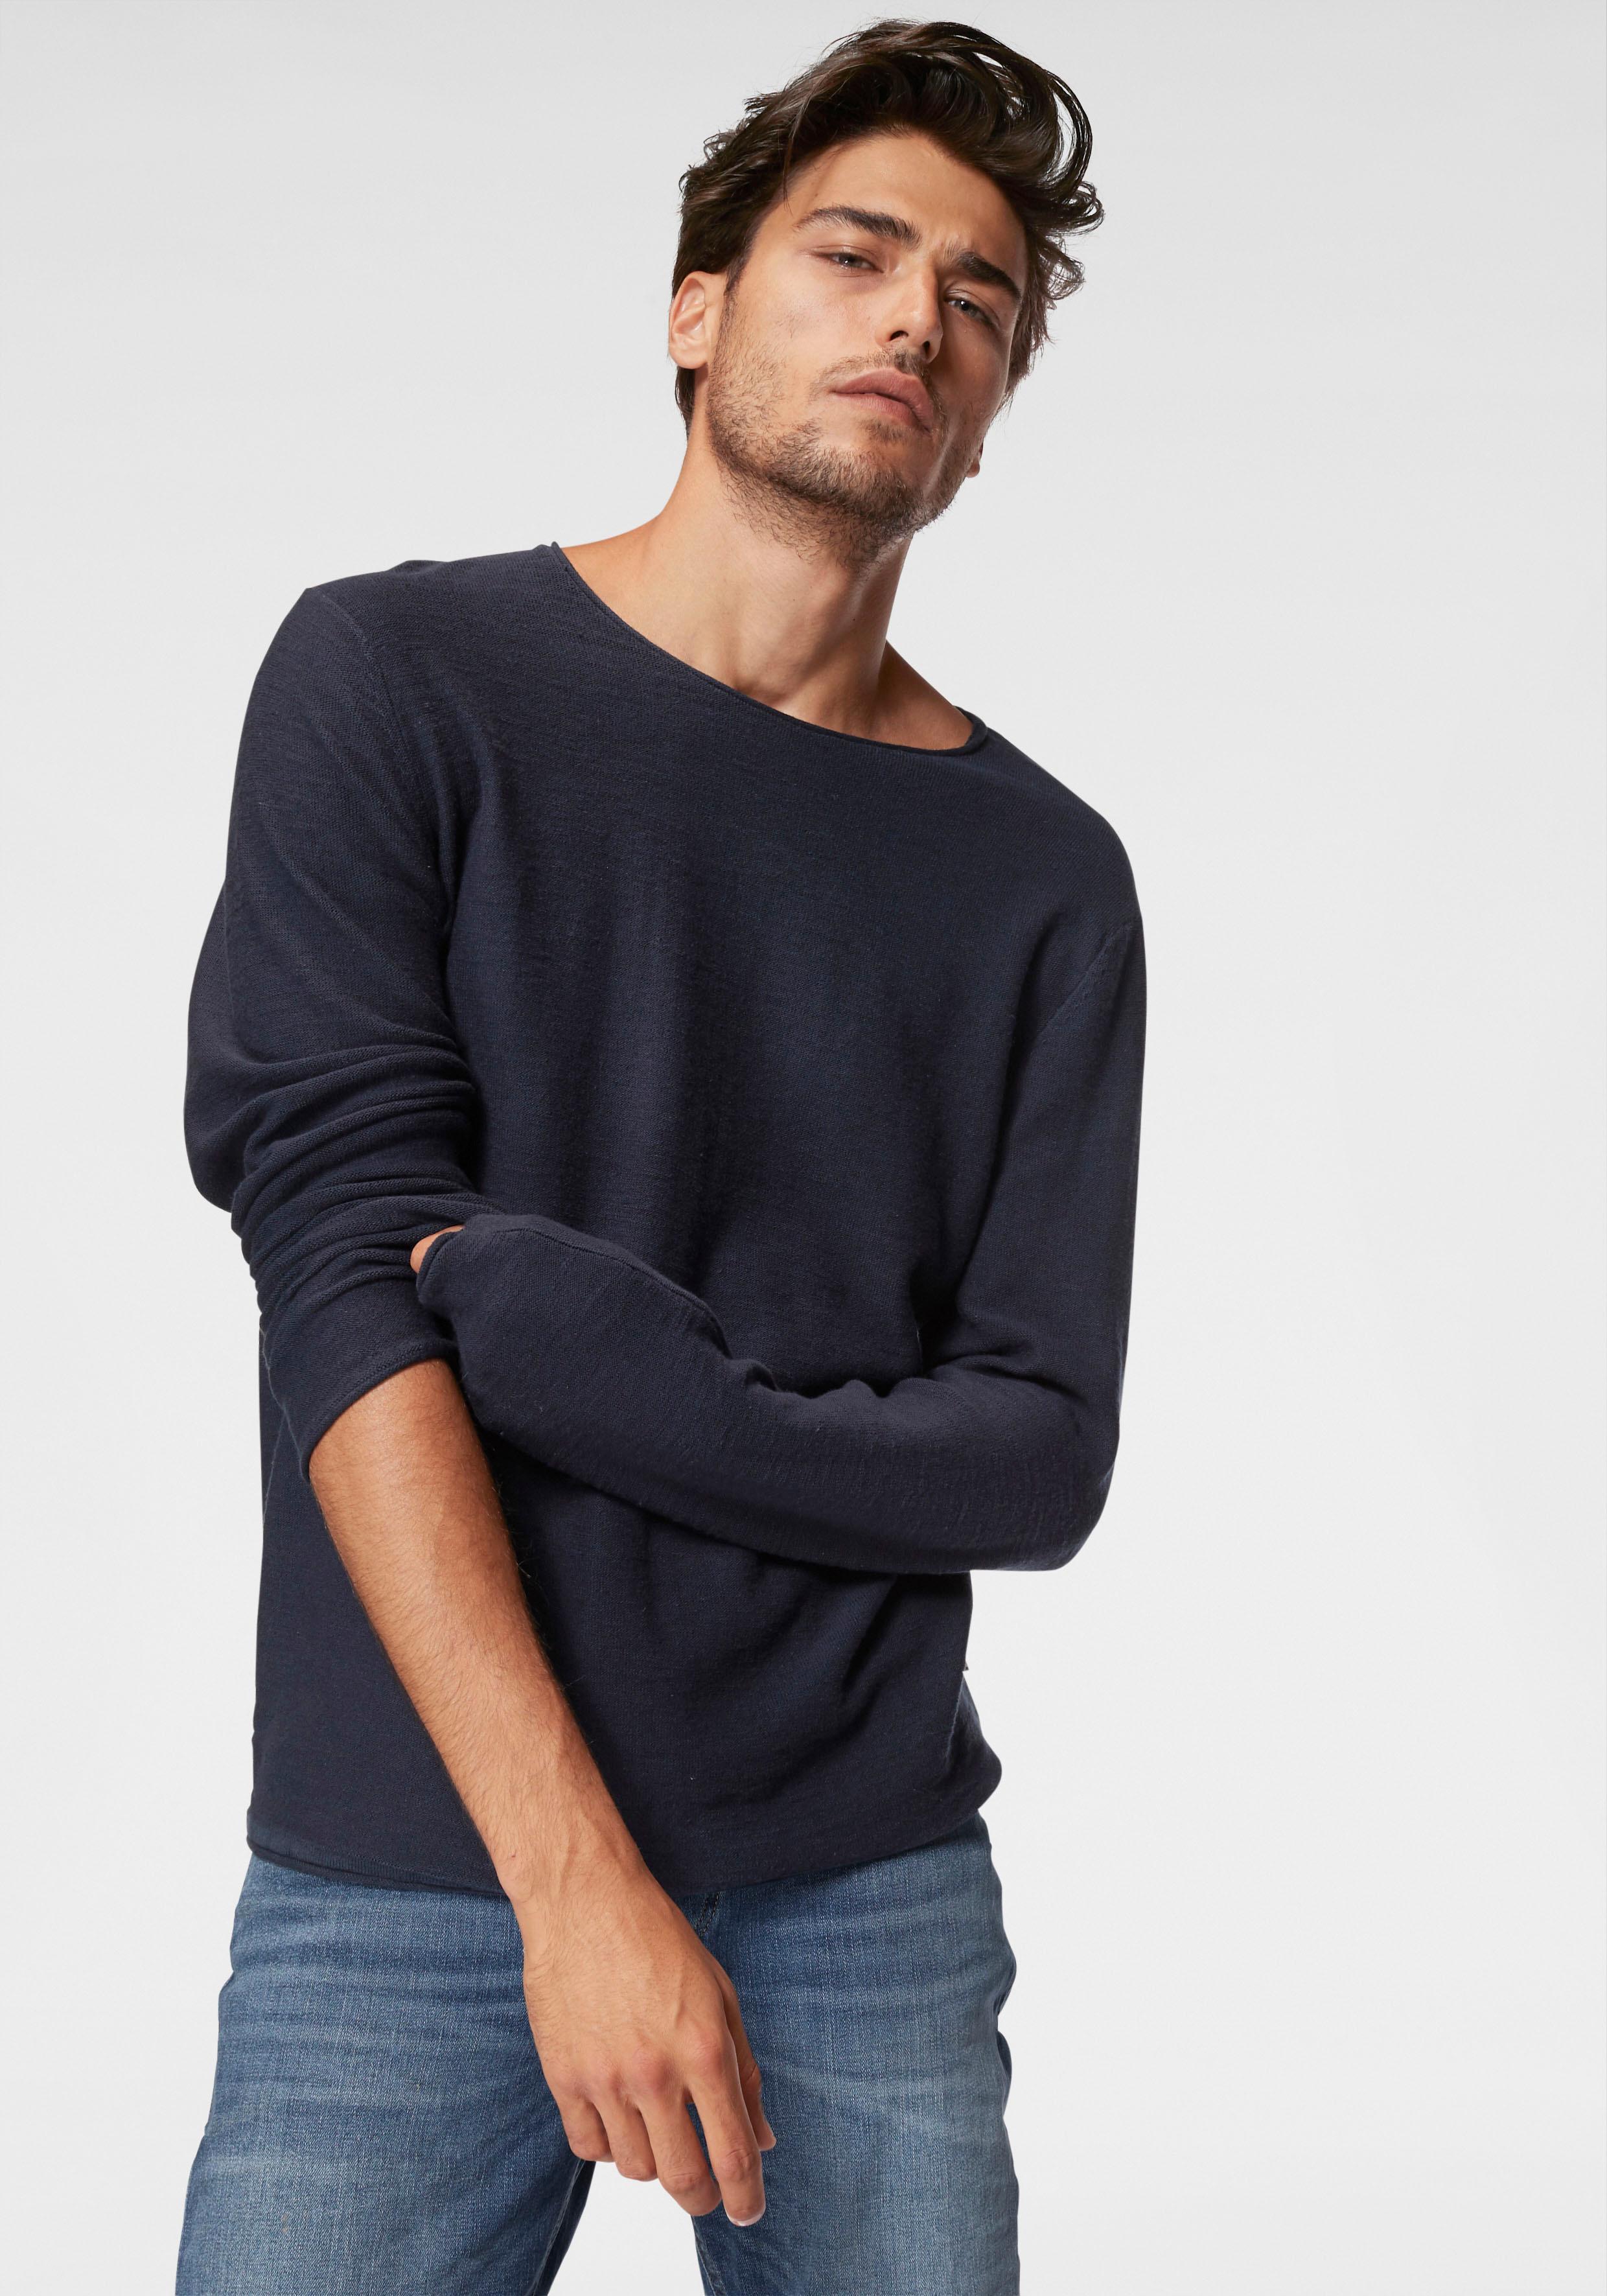 Jack & Jones Rundhalspullover SLUB KNIT CREW NECK   Bekleidung > Pullover > Rundhalspullover   Blau   jack & jones